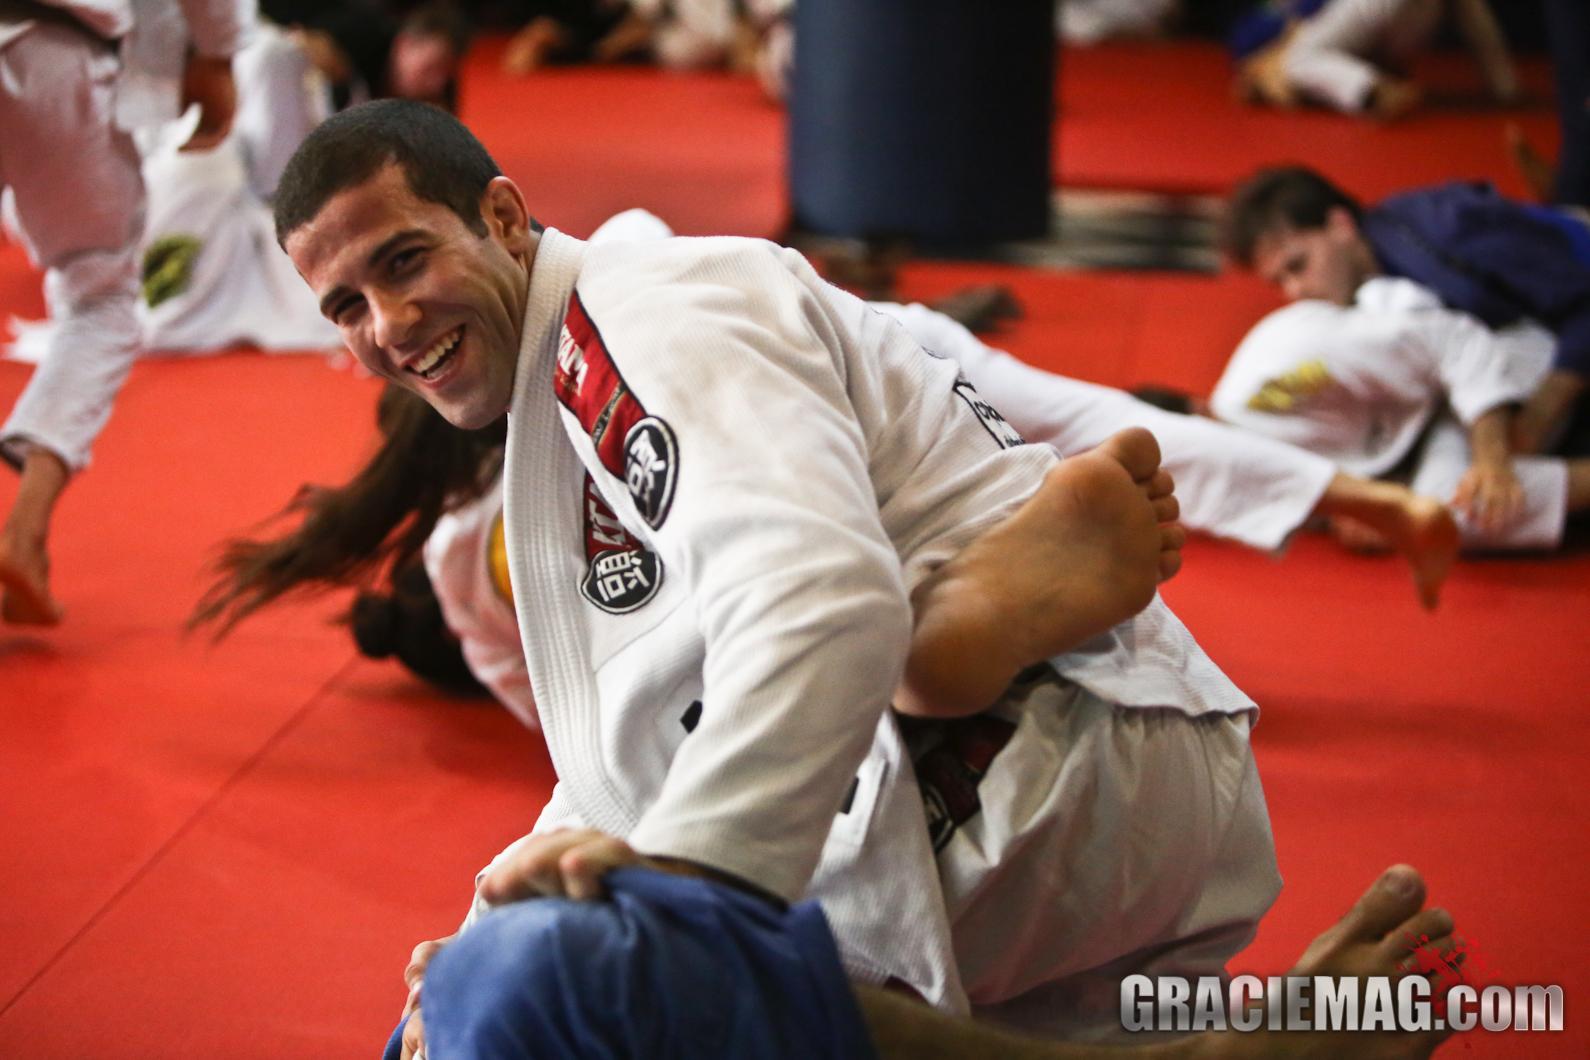 Tanquinho enjoying his time on the mat / Photo: Erin Herle